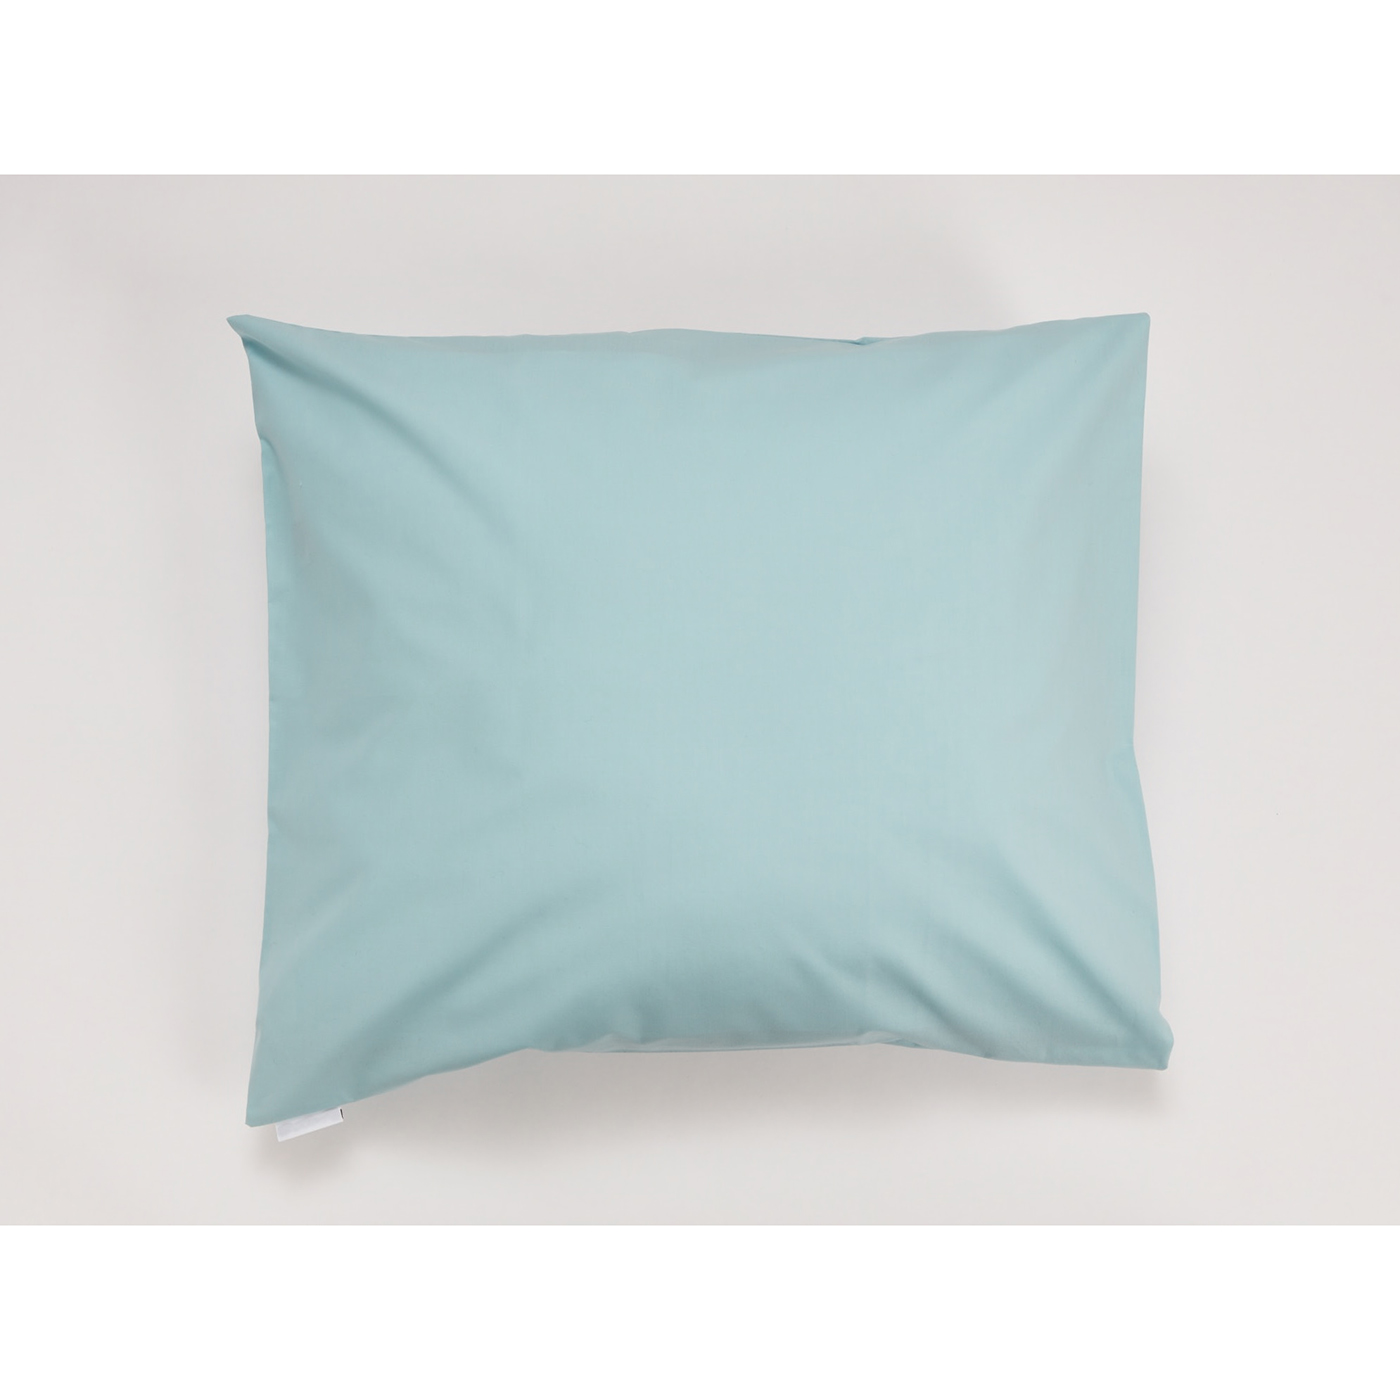 Snoooze cotton pillowcase (duck egg blue)